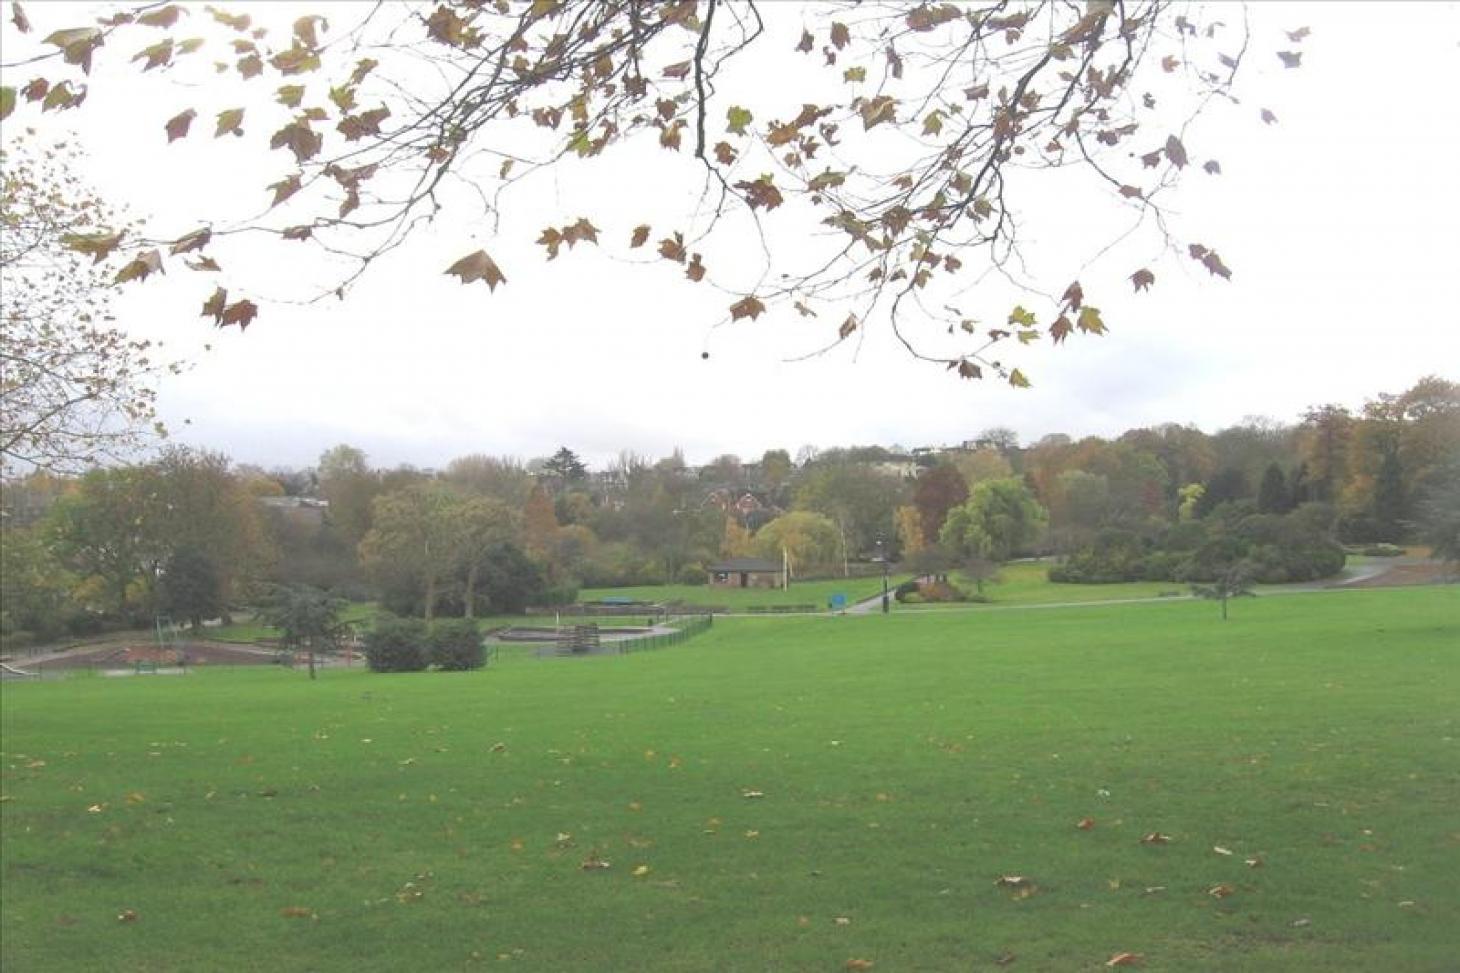 Sydenham Wells Park 5 a side | Concrete football pitch